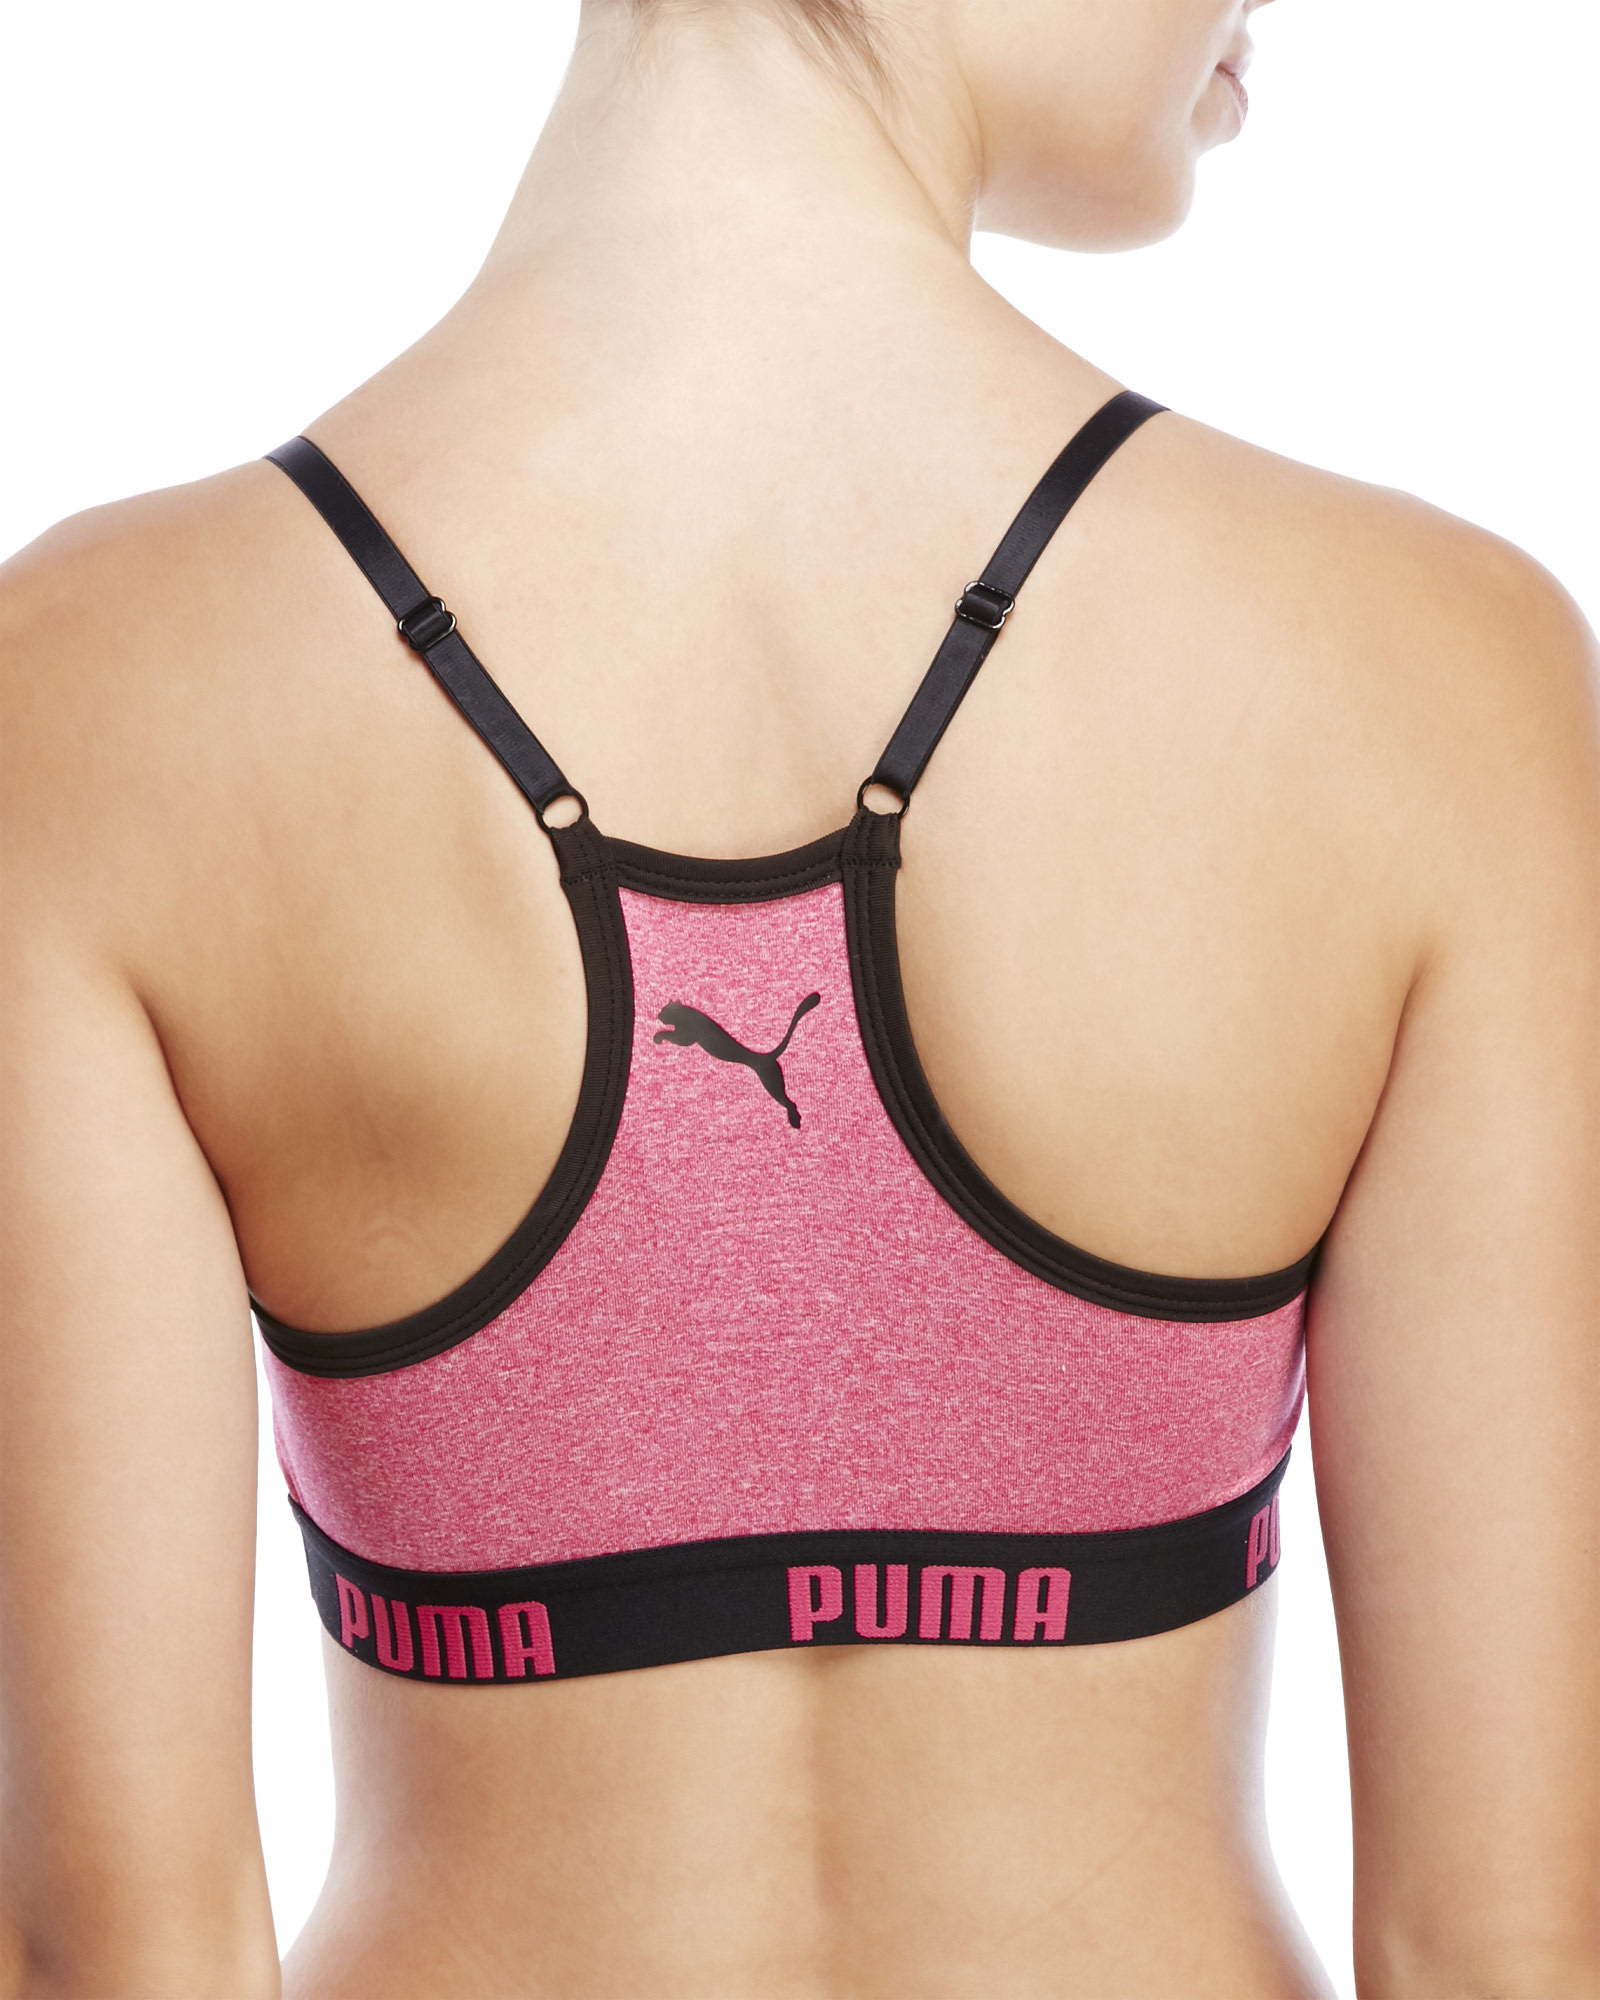 puma purple seamless sports bra removable cups